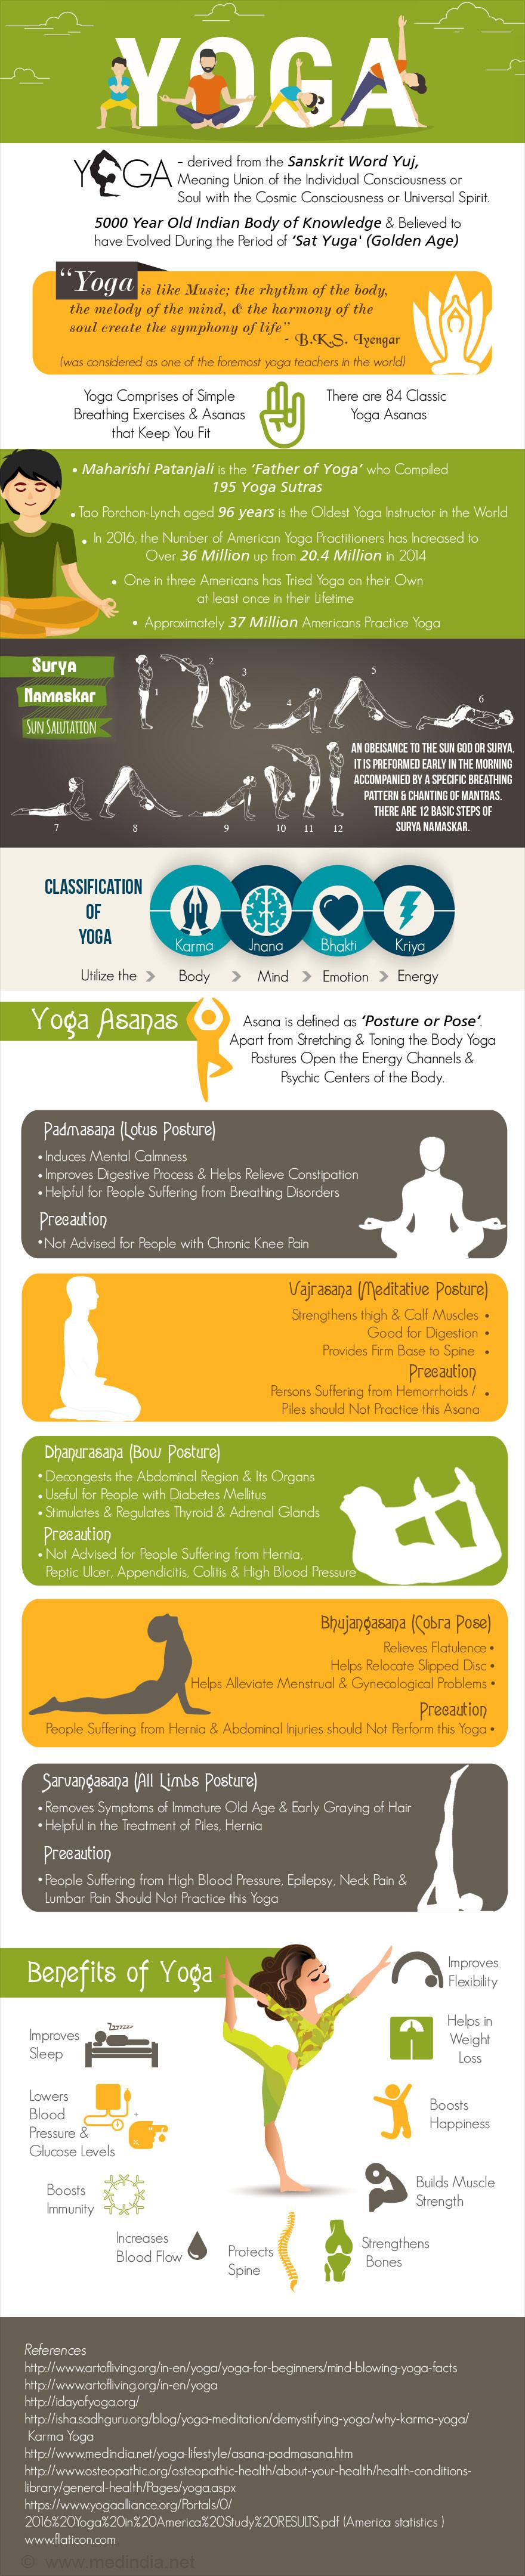 Yoga - Infographic